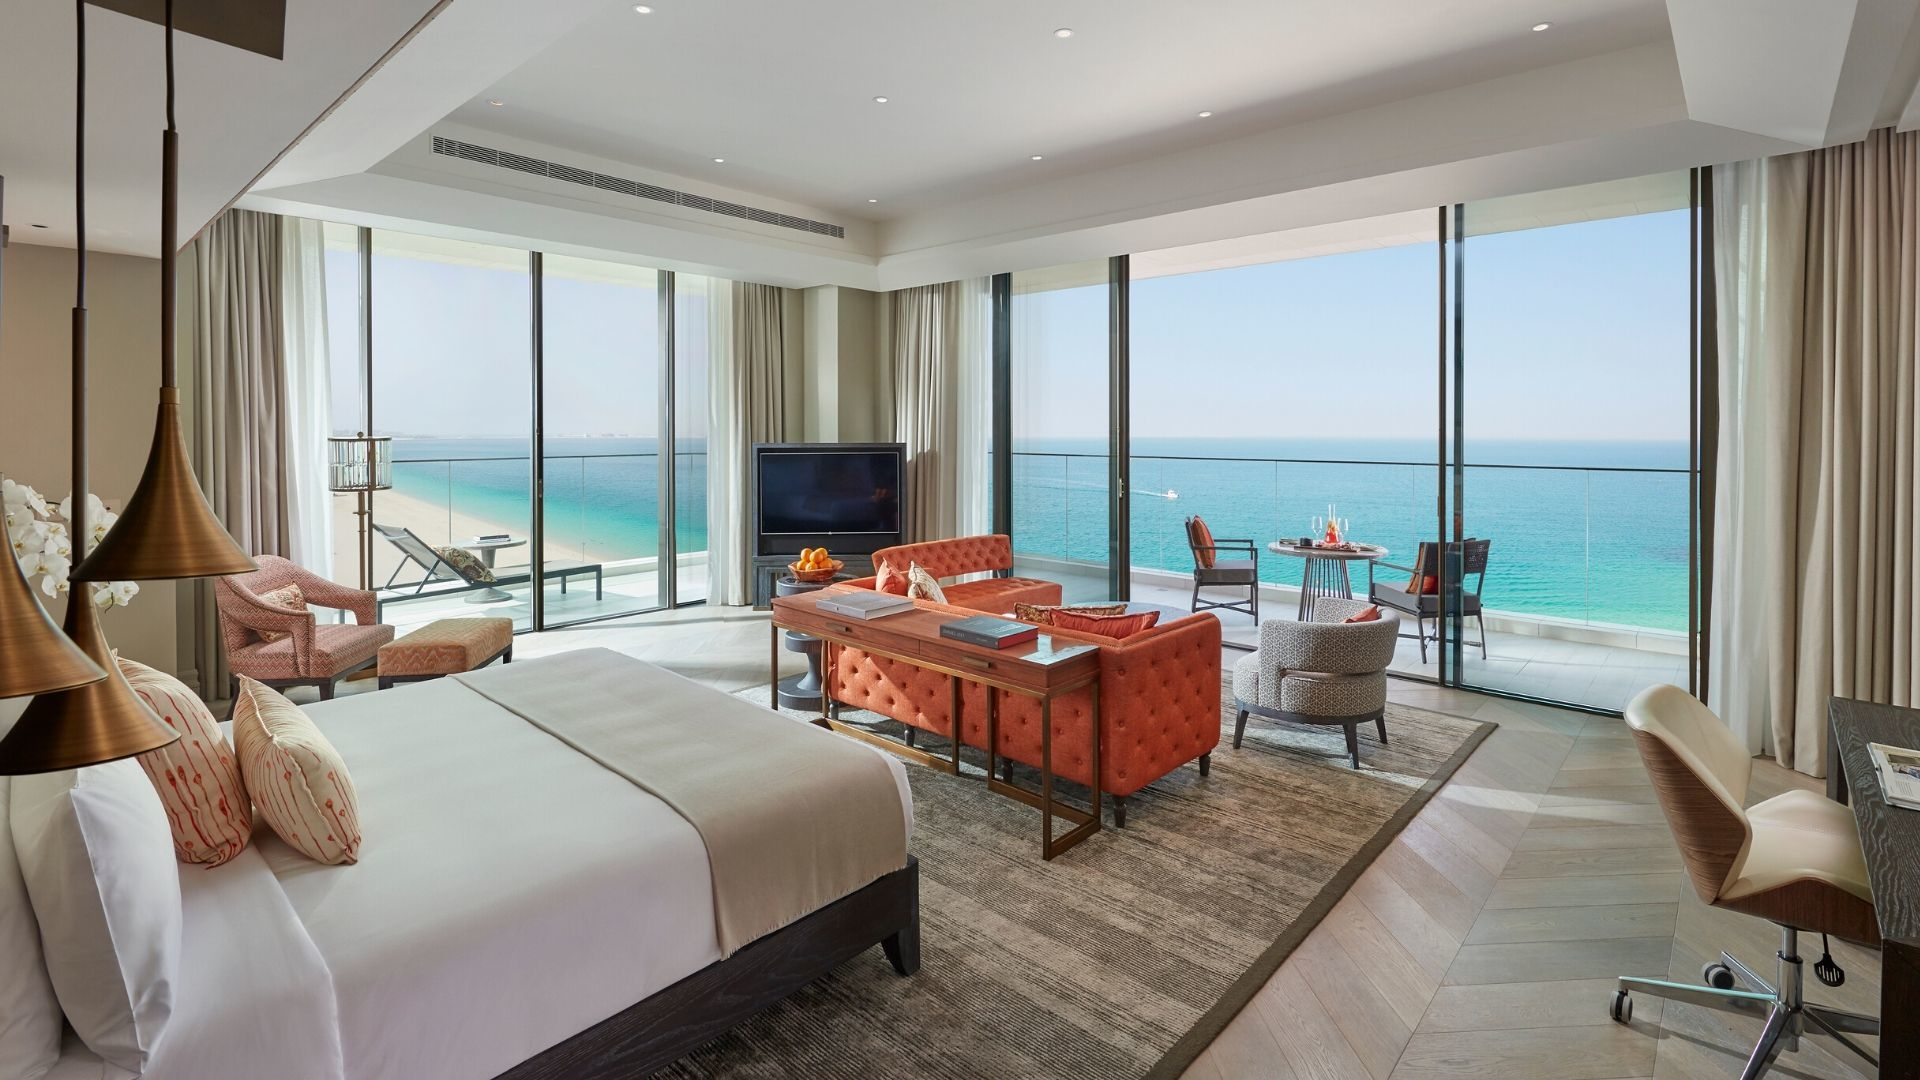 The Escape | Suite Dreams At The Mandarin Oriental Jumeira, Dubai